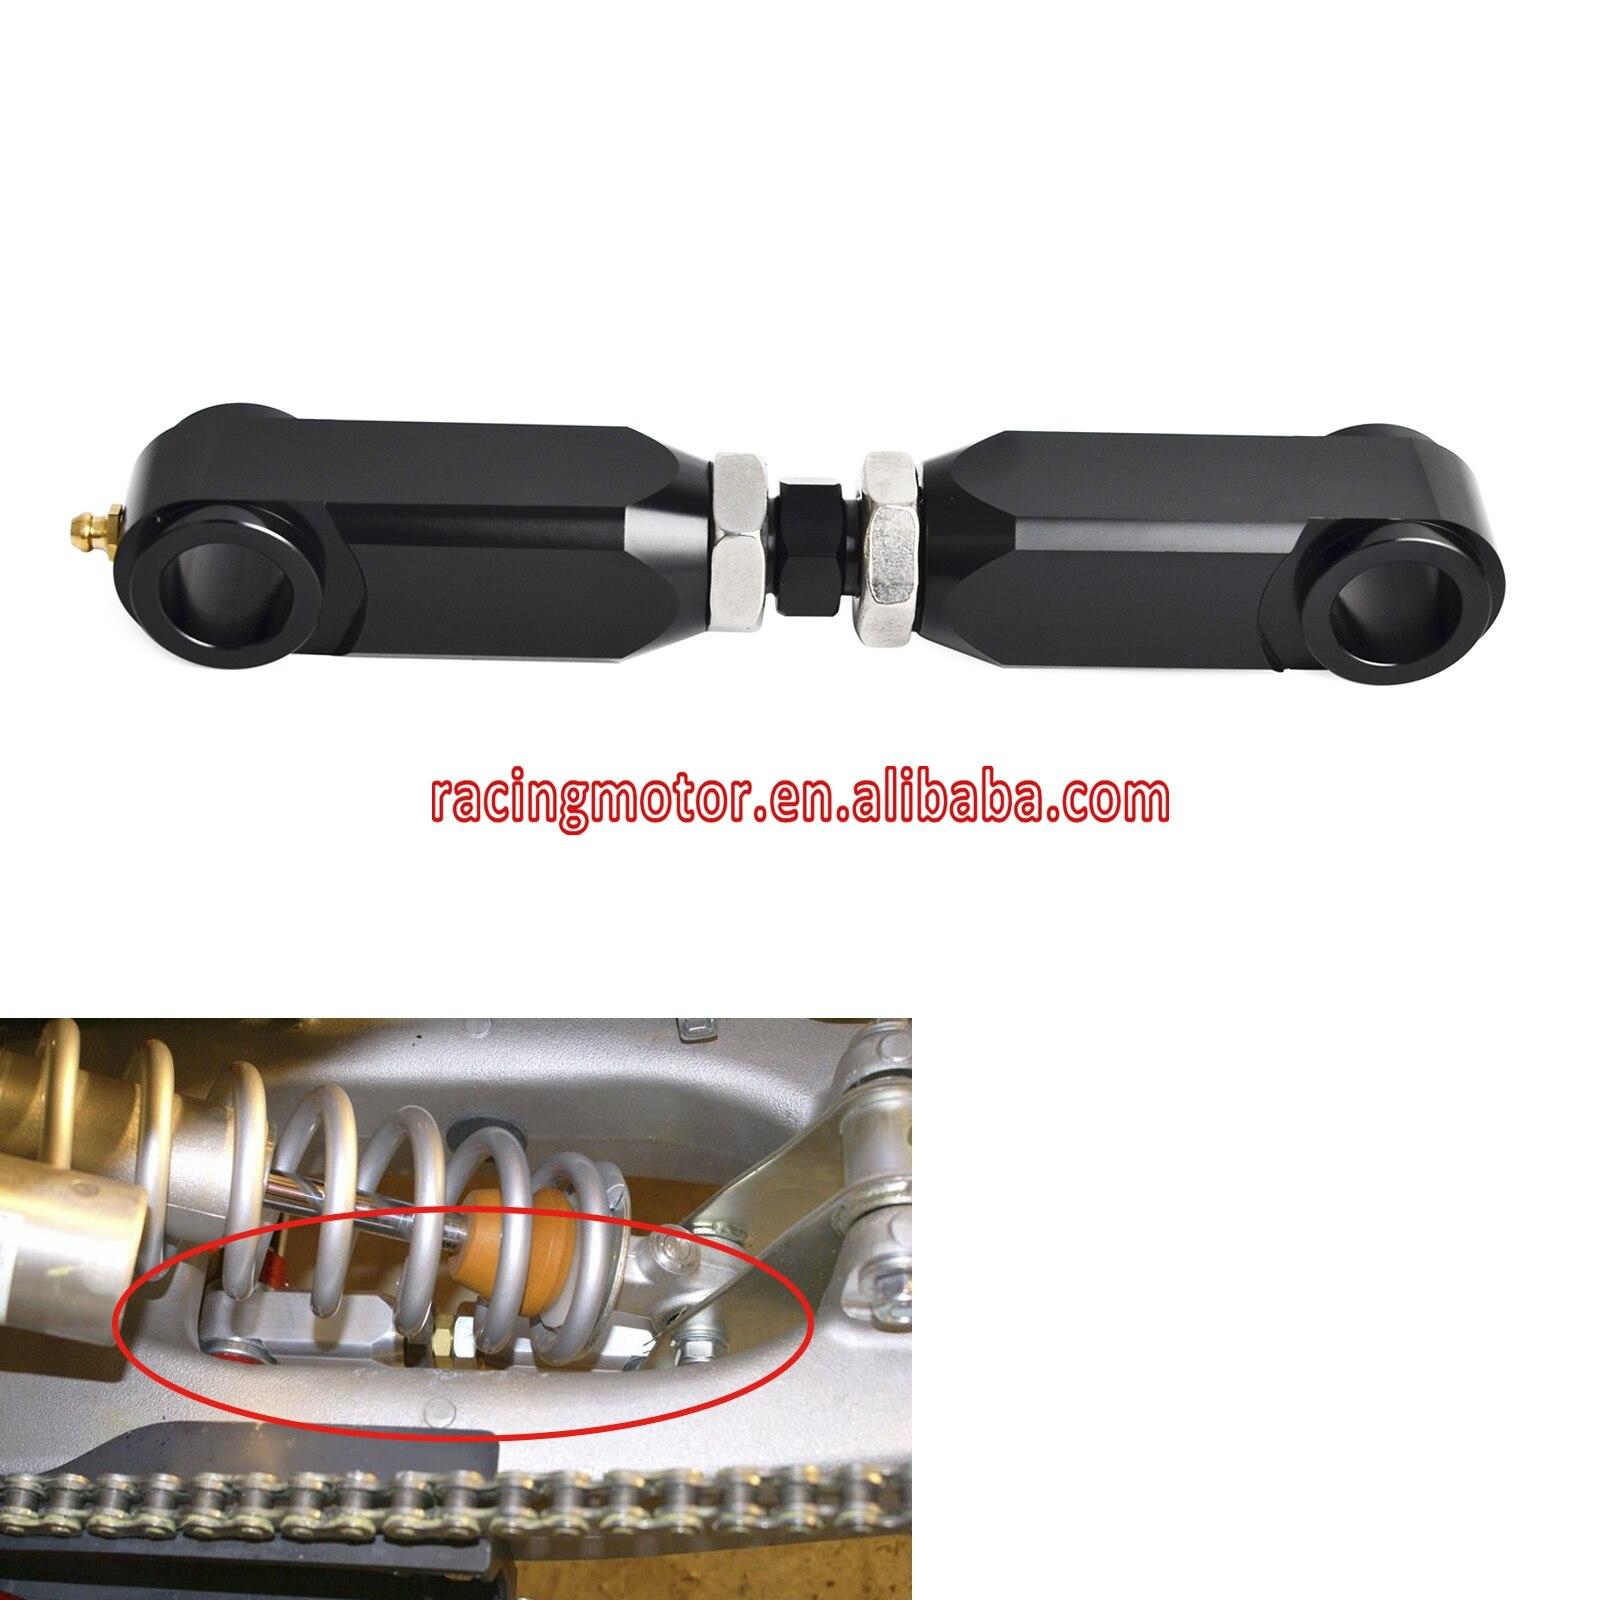 Adjustable Rear Lowering Kit Arm Relay Connecting Rod For Yamaha Raptor 350 660 600R 700 YFM350 04-13 YFM660R 01-05 YFM700 06-17<br>